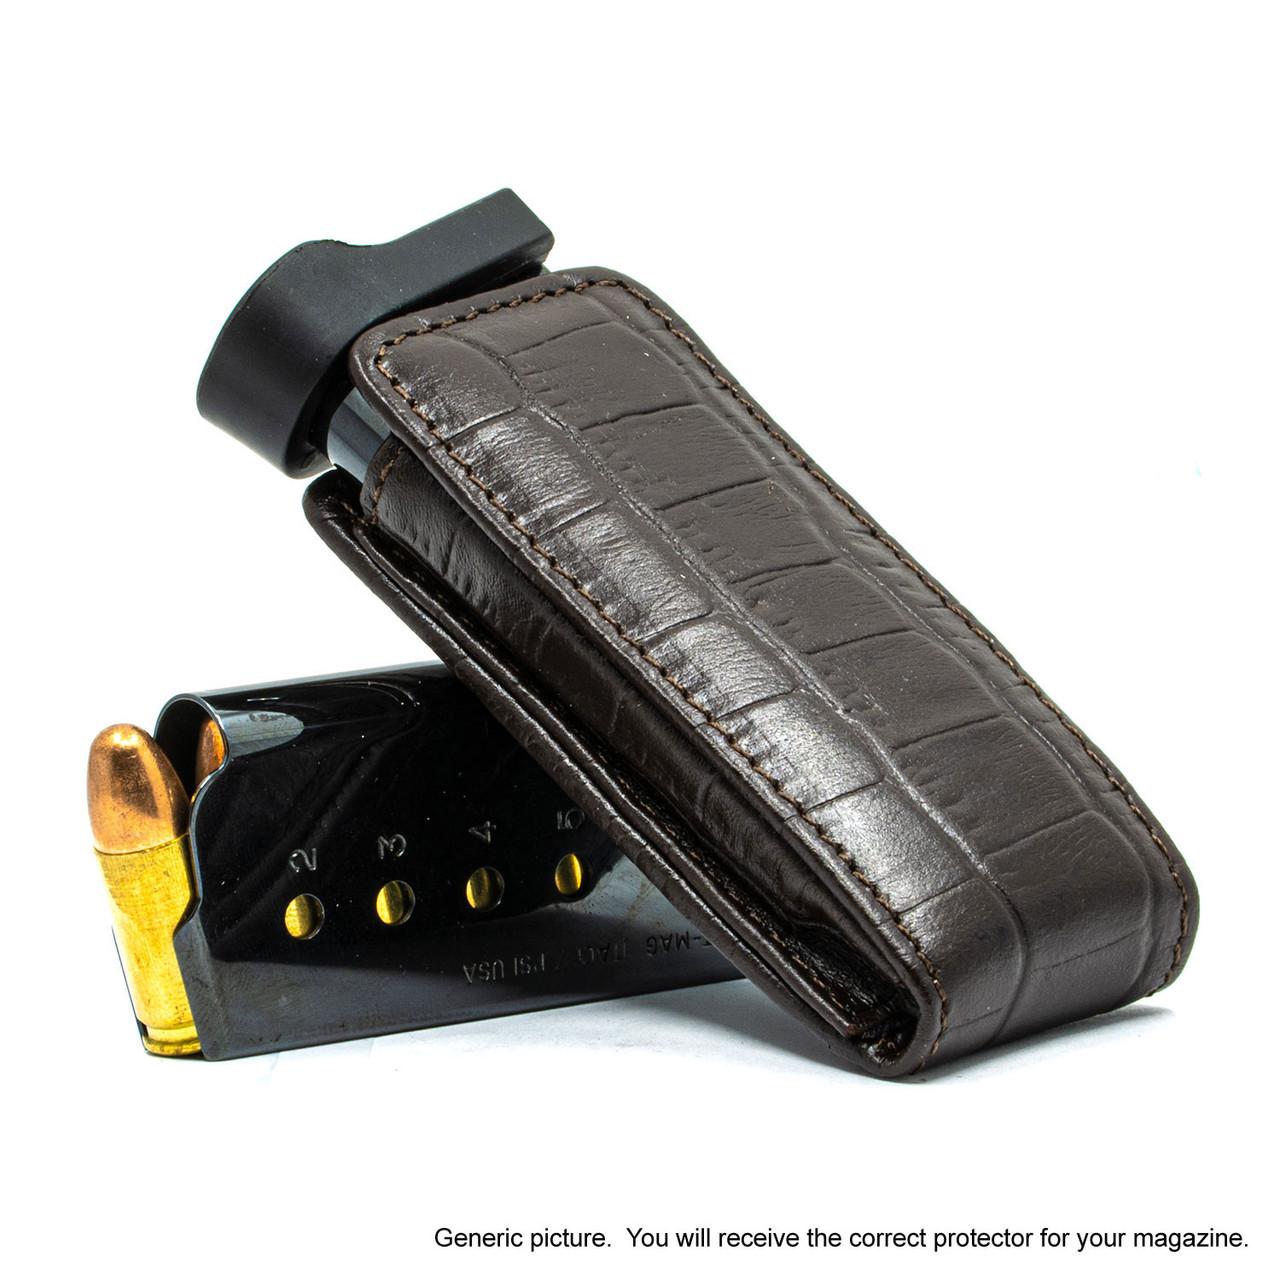 CZ 75D Compact Brown Alligator Magazine Pocket Protector